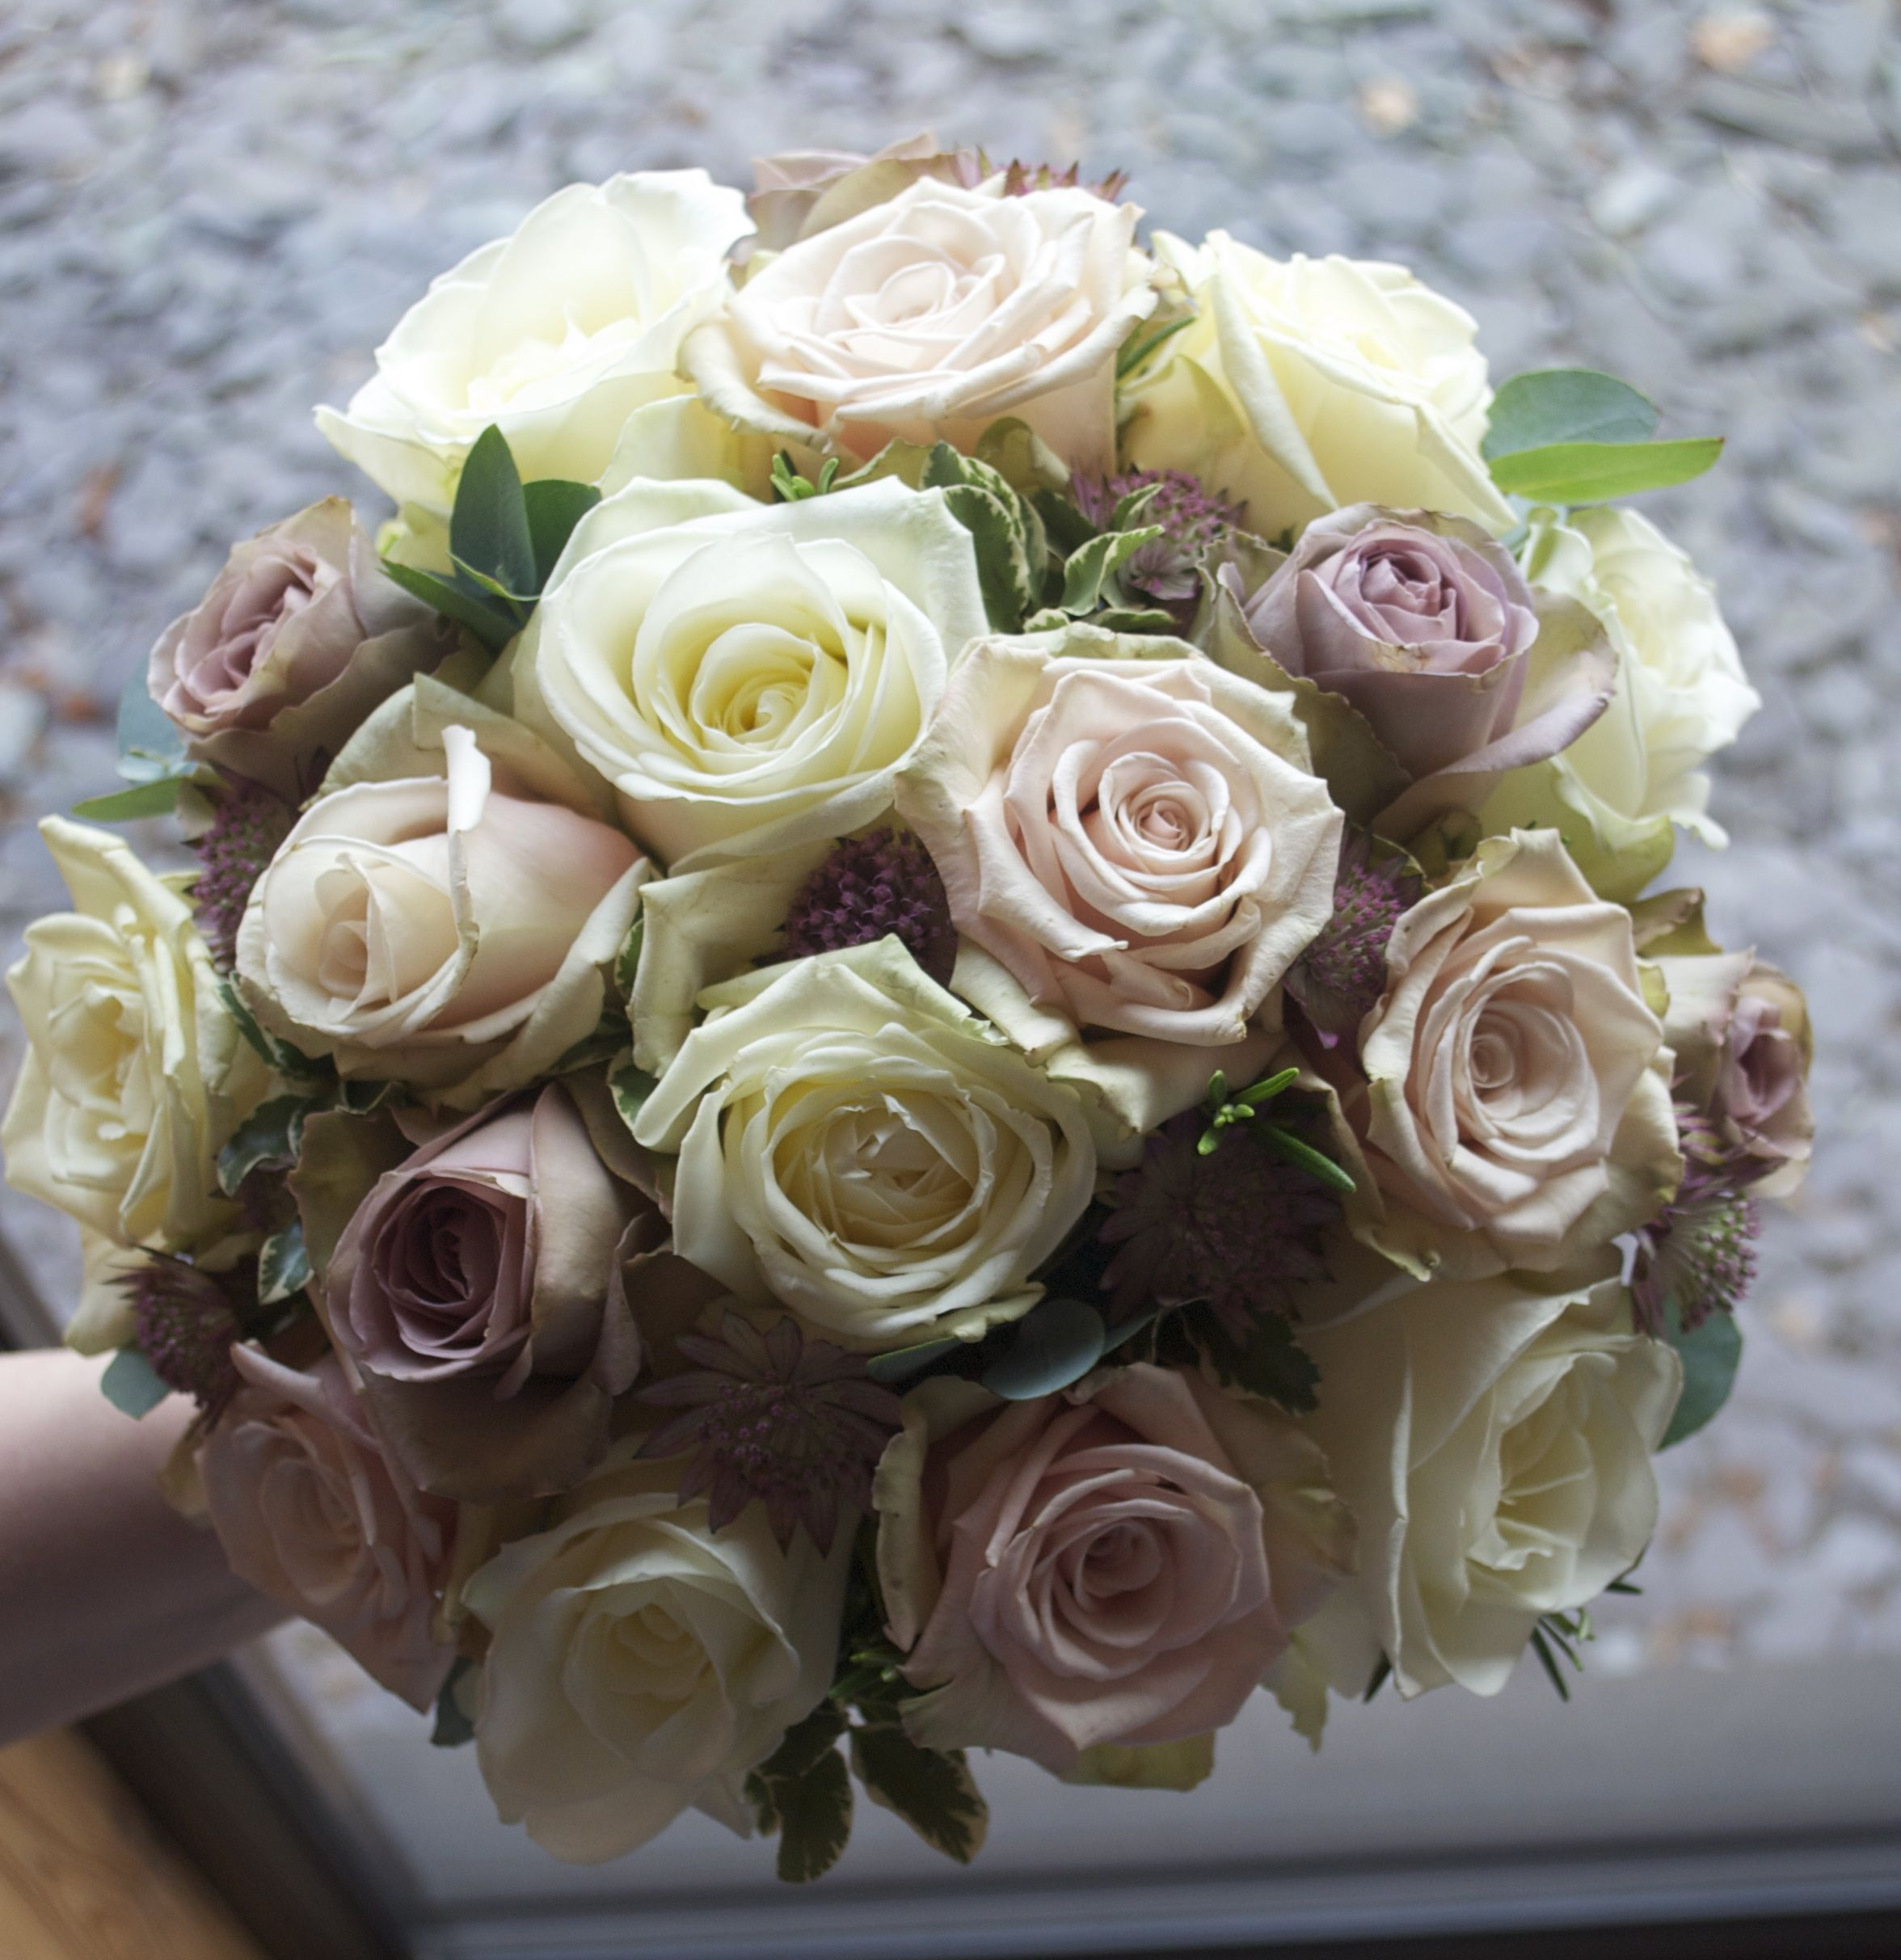 Vintage Flower Arrangements For Wedding: Styal Lodge Wedding Flowers